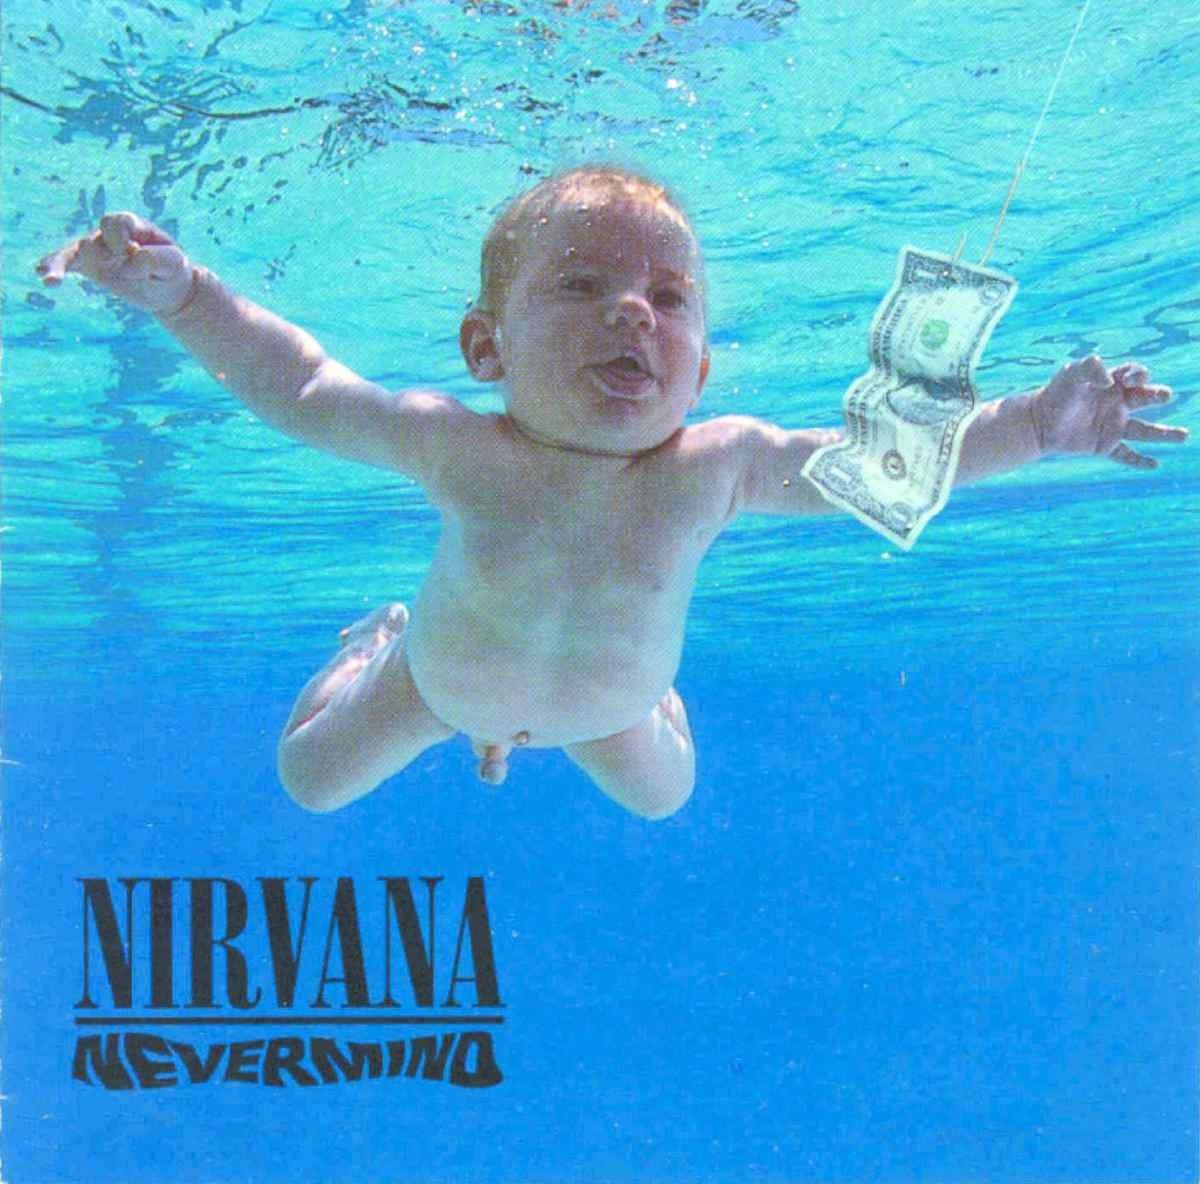 Nirvana nevermind demanda